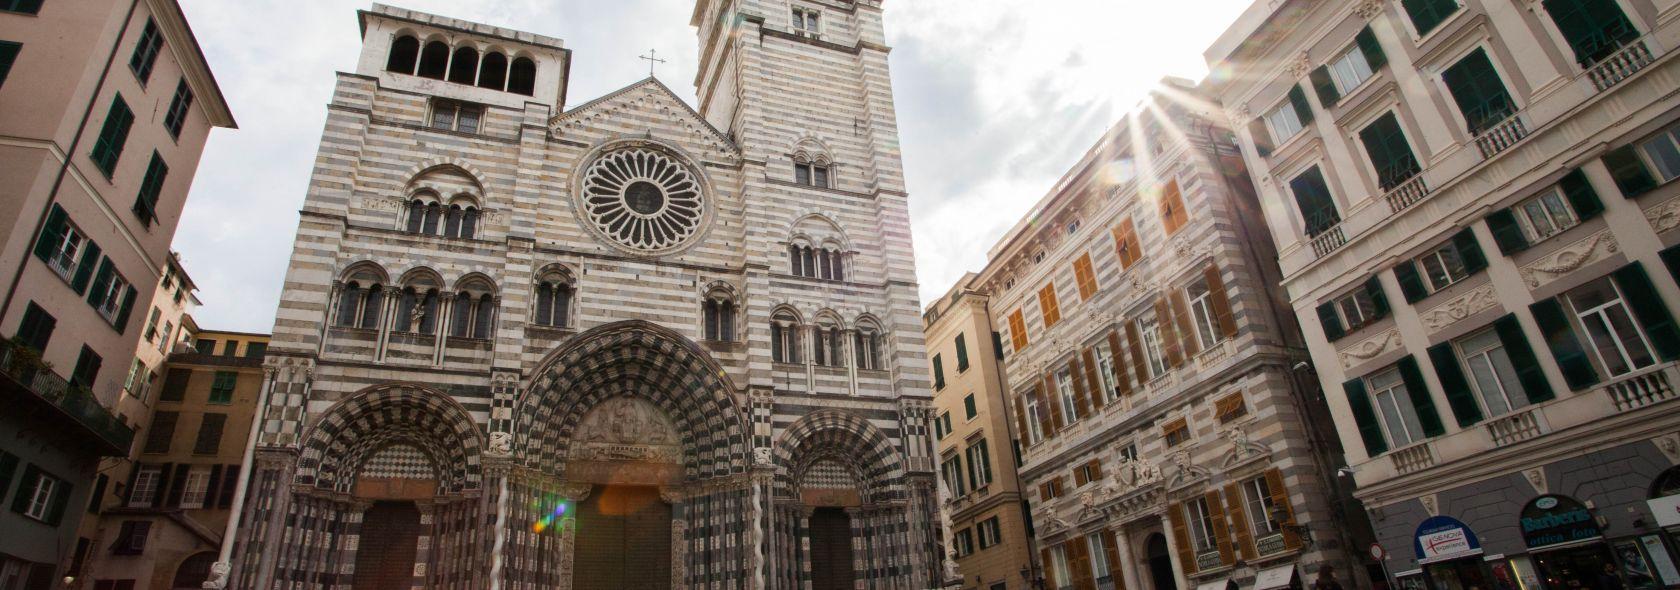 Cattedrale di San Lorenzo - foto: @xedum